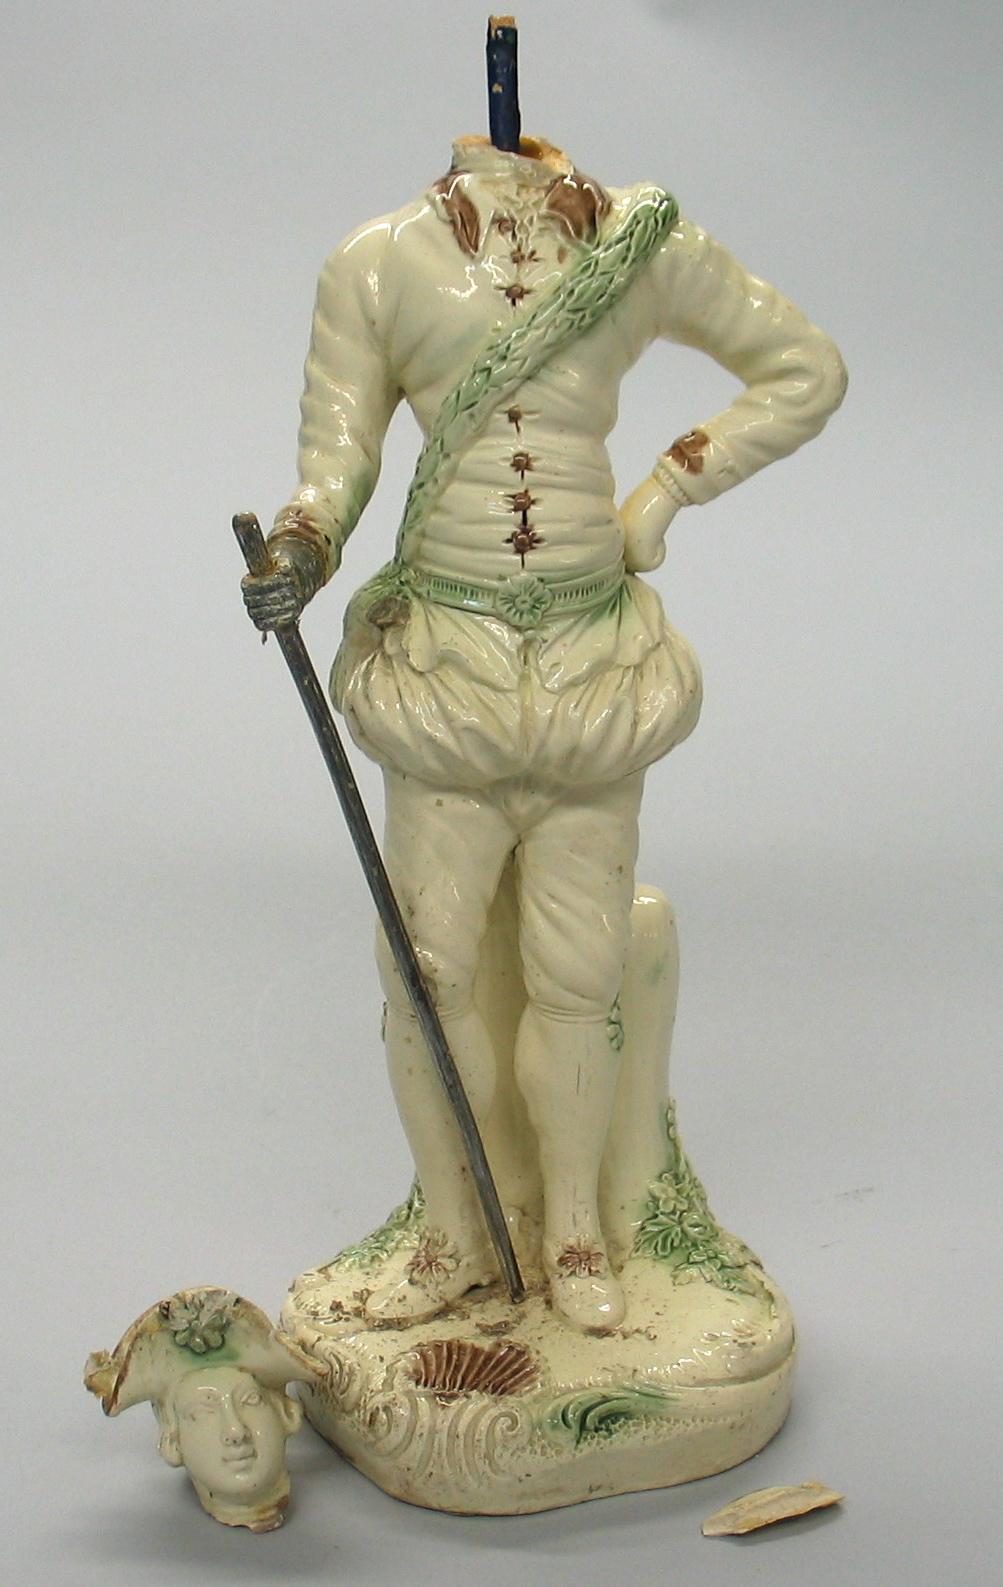 Astbury-Whieldon Figure of a Cavalier, ca. 1745